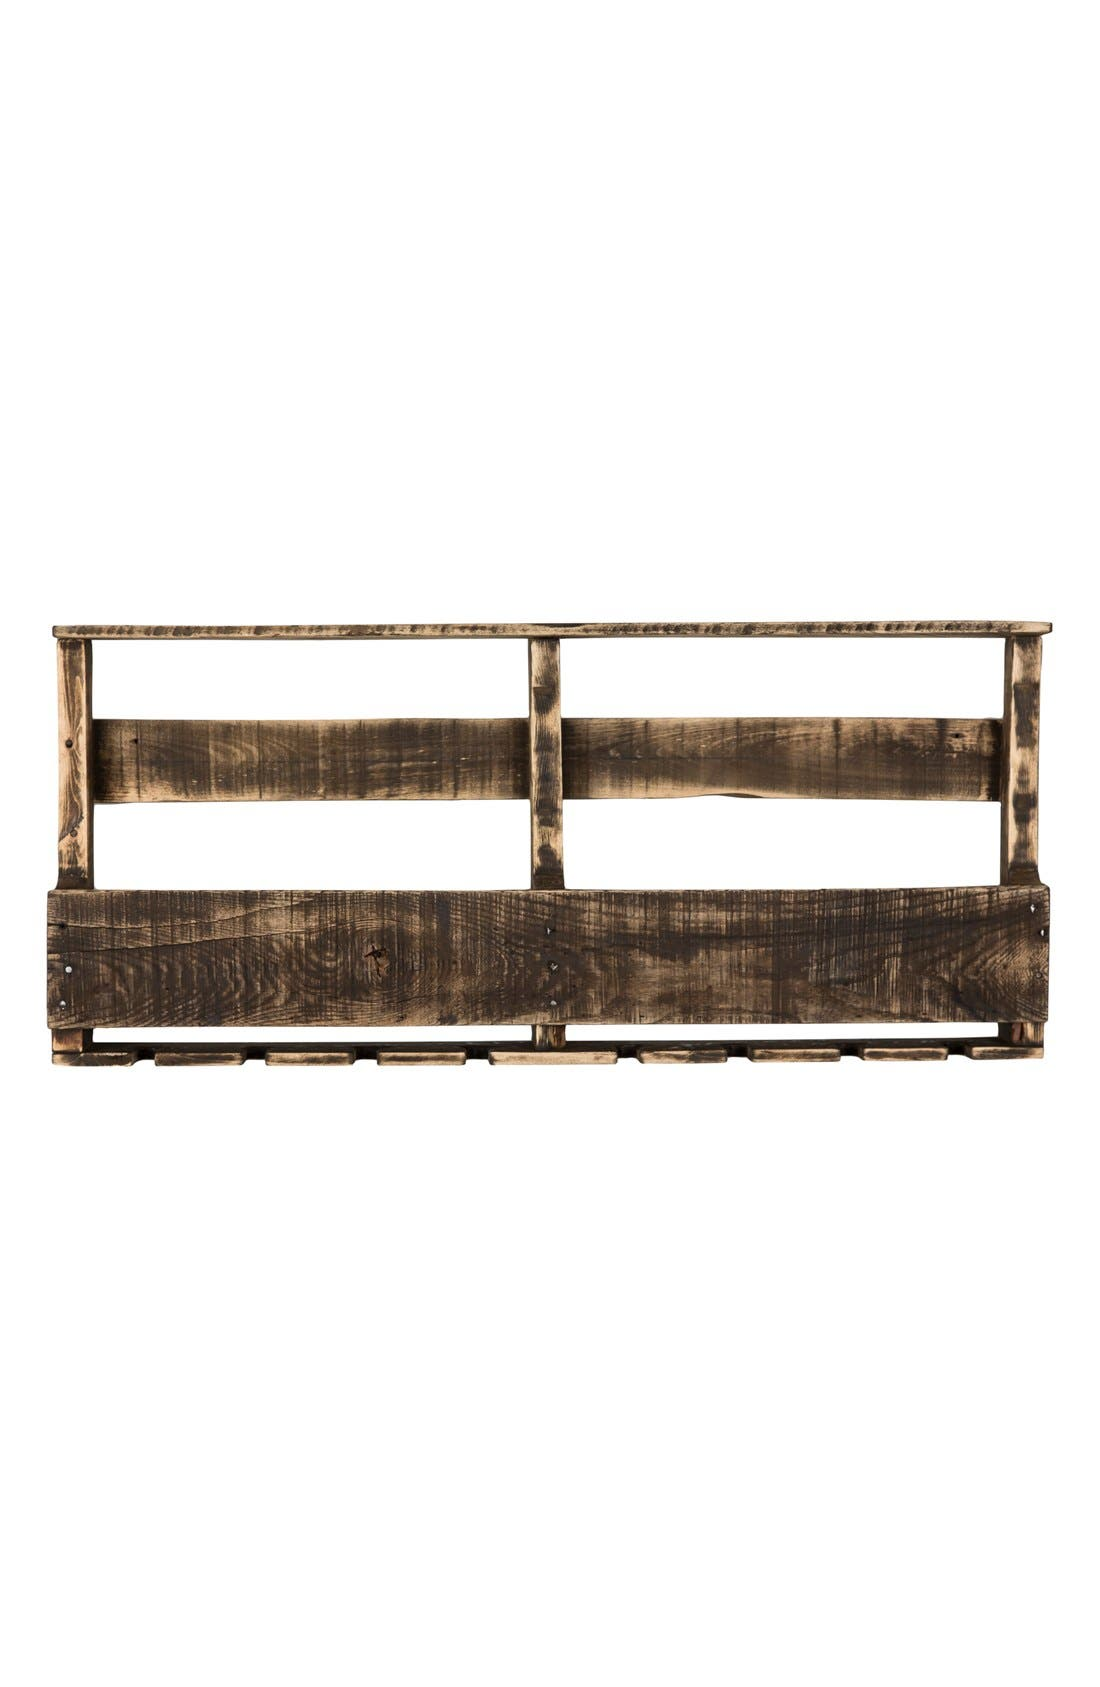 (del) Hutson Designs 'Top Shelf' RepurposedWood Wine Rack